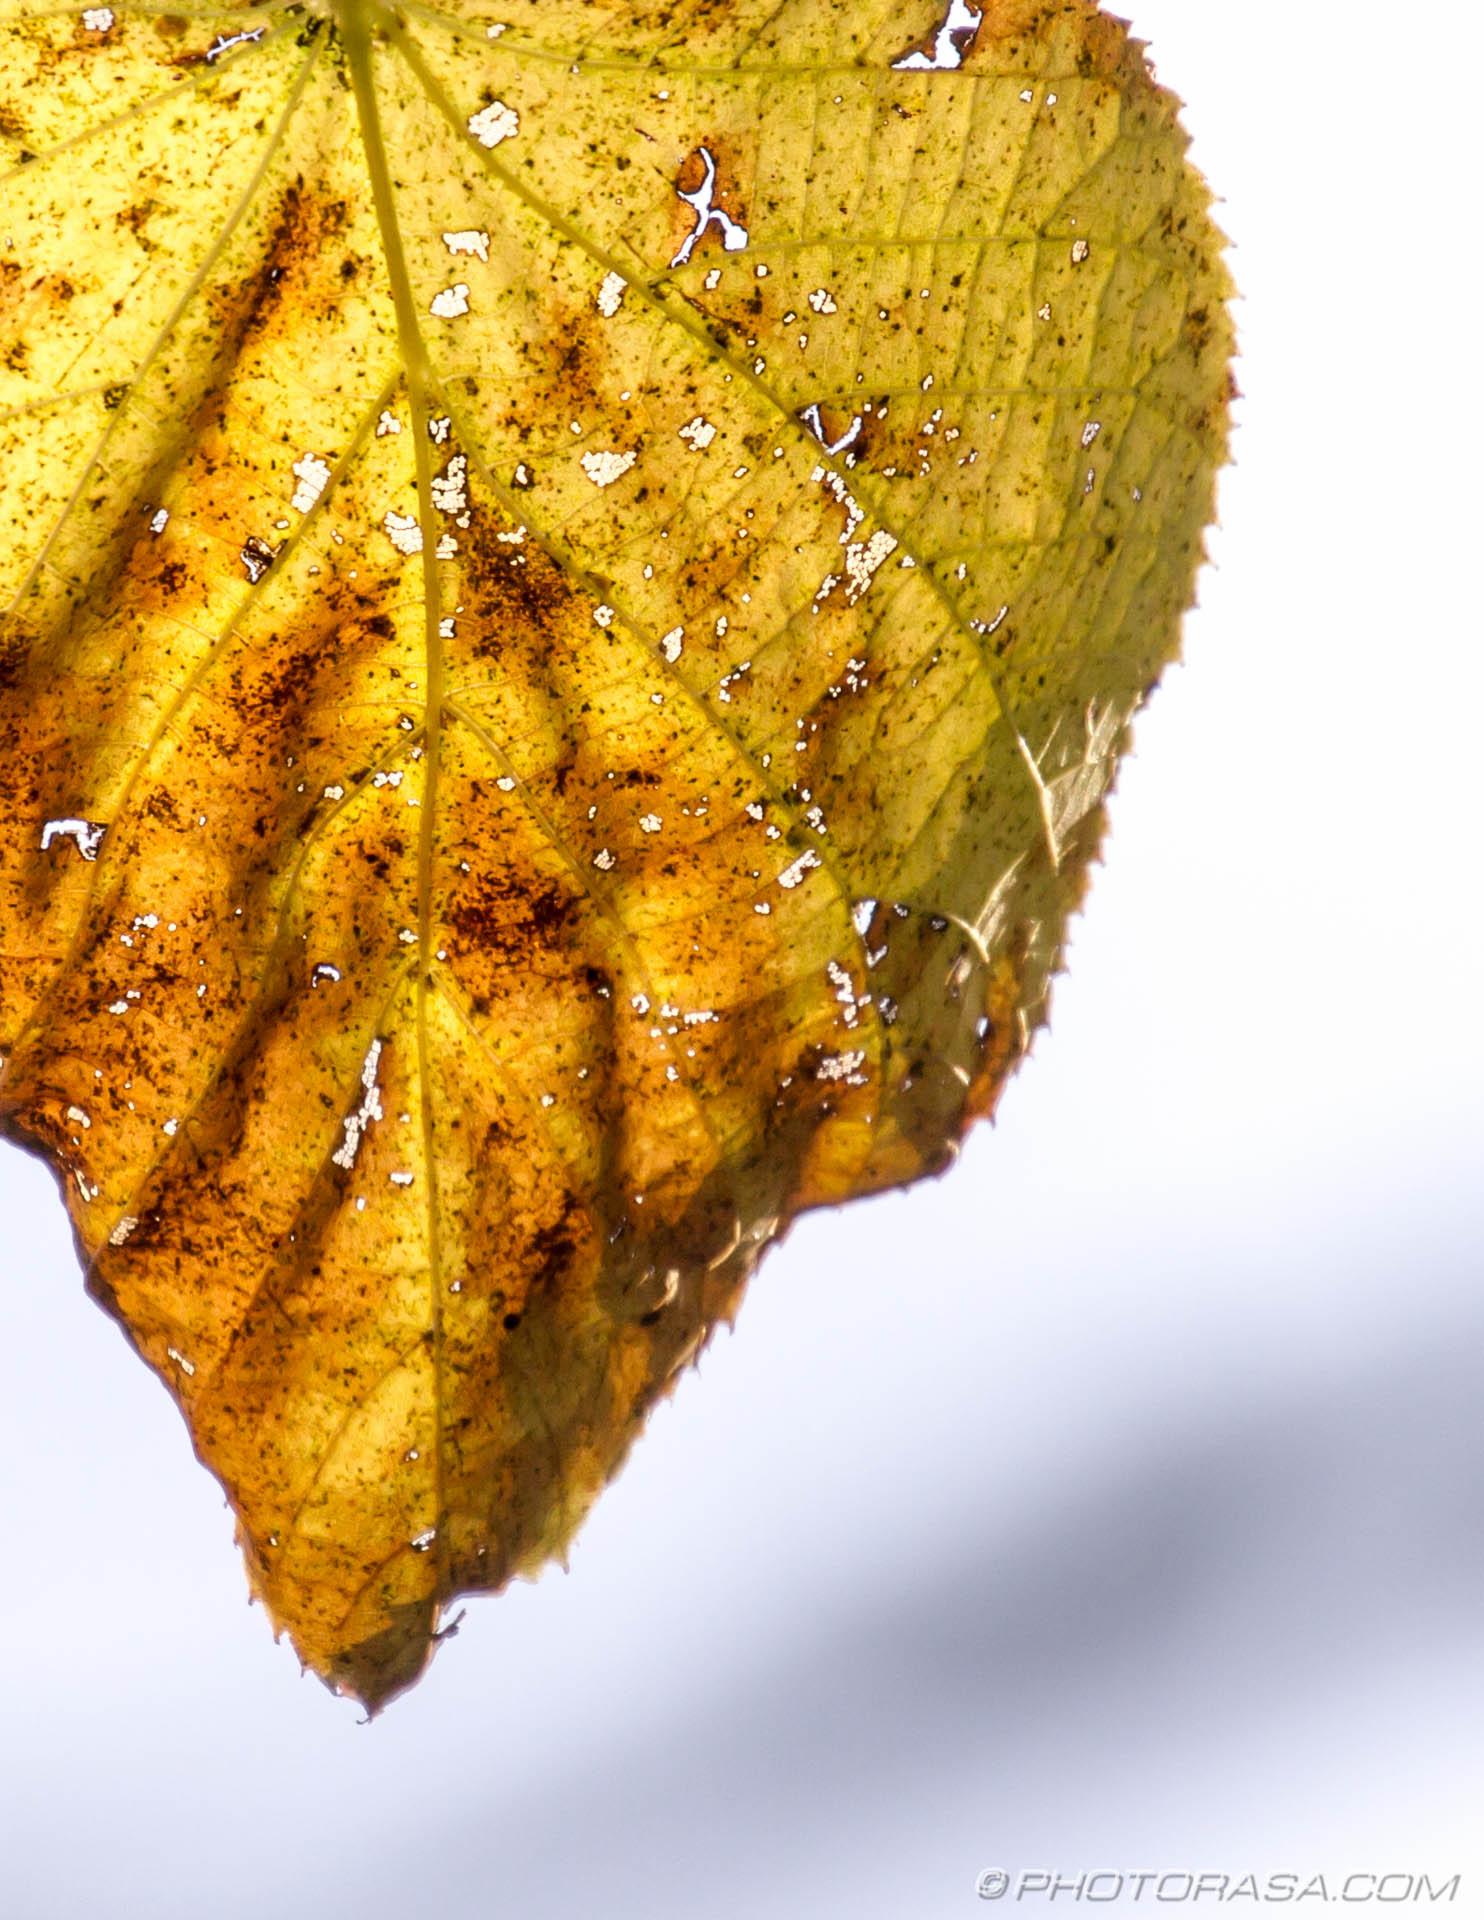 http://photorasa.com/autumn-leaves/old-autumn-leaf-full-of-holes/